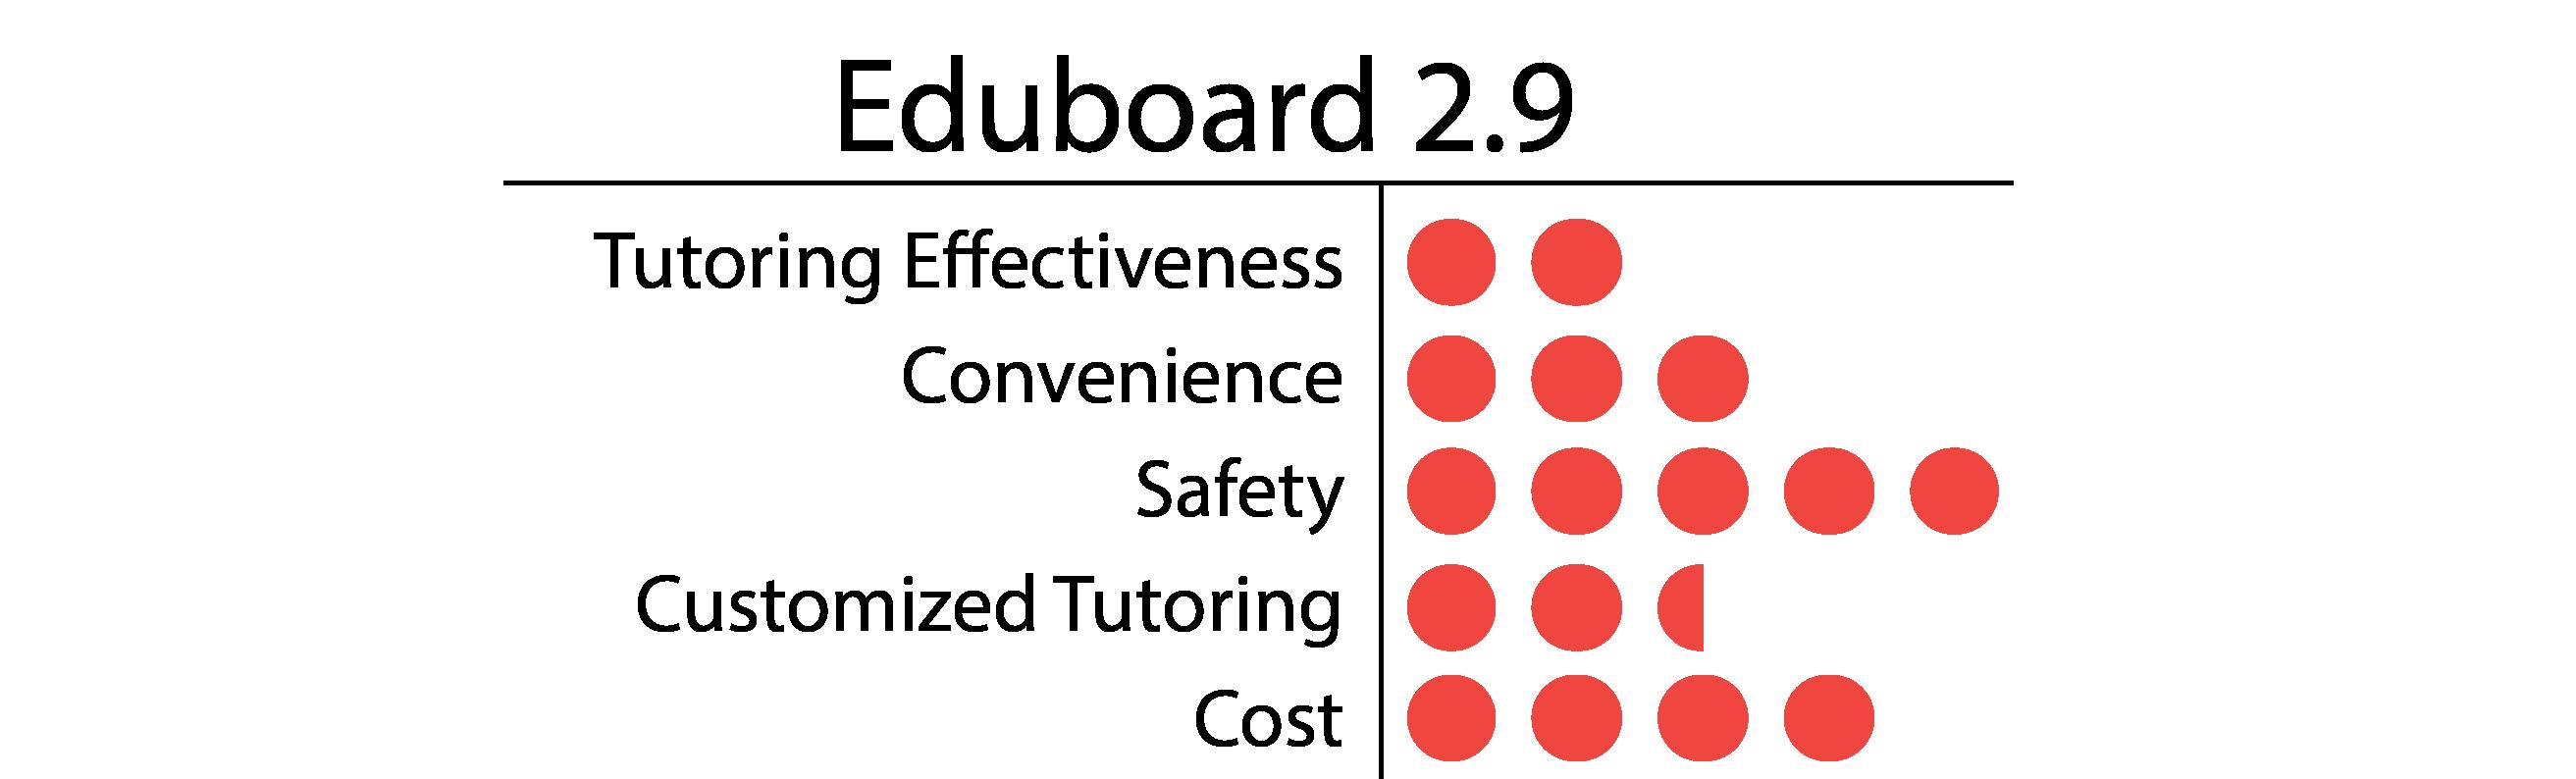 Eduboard-01